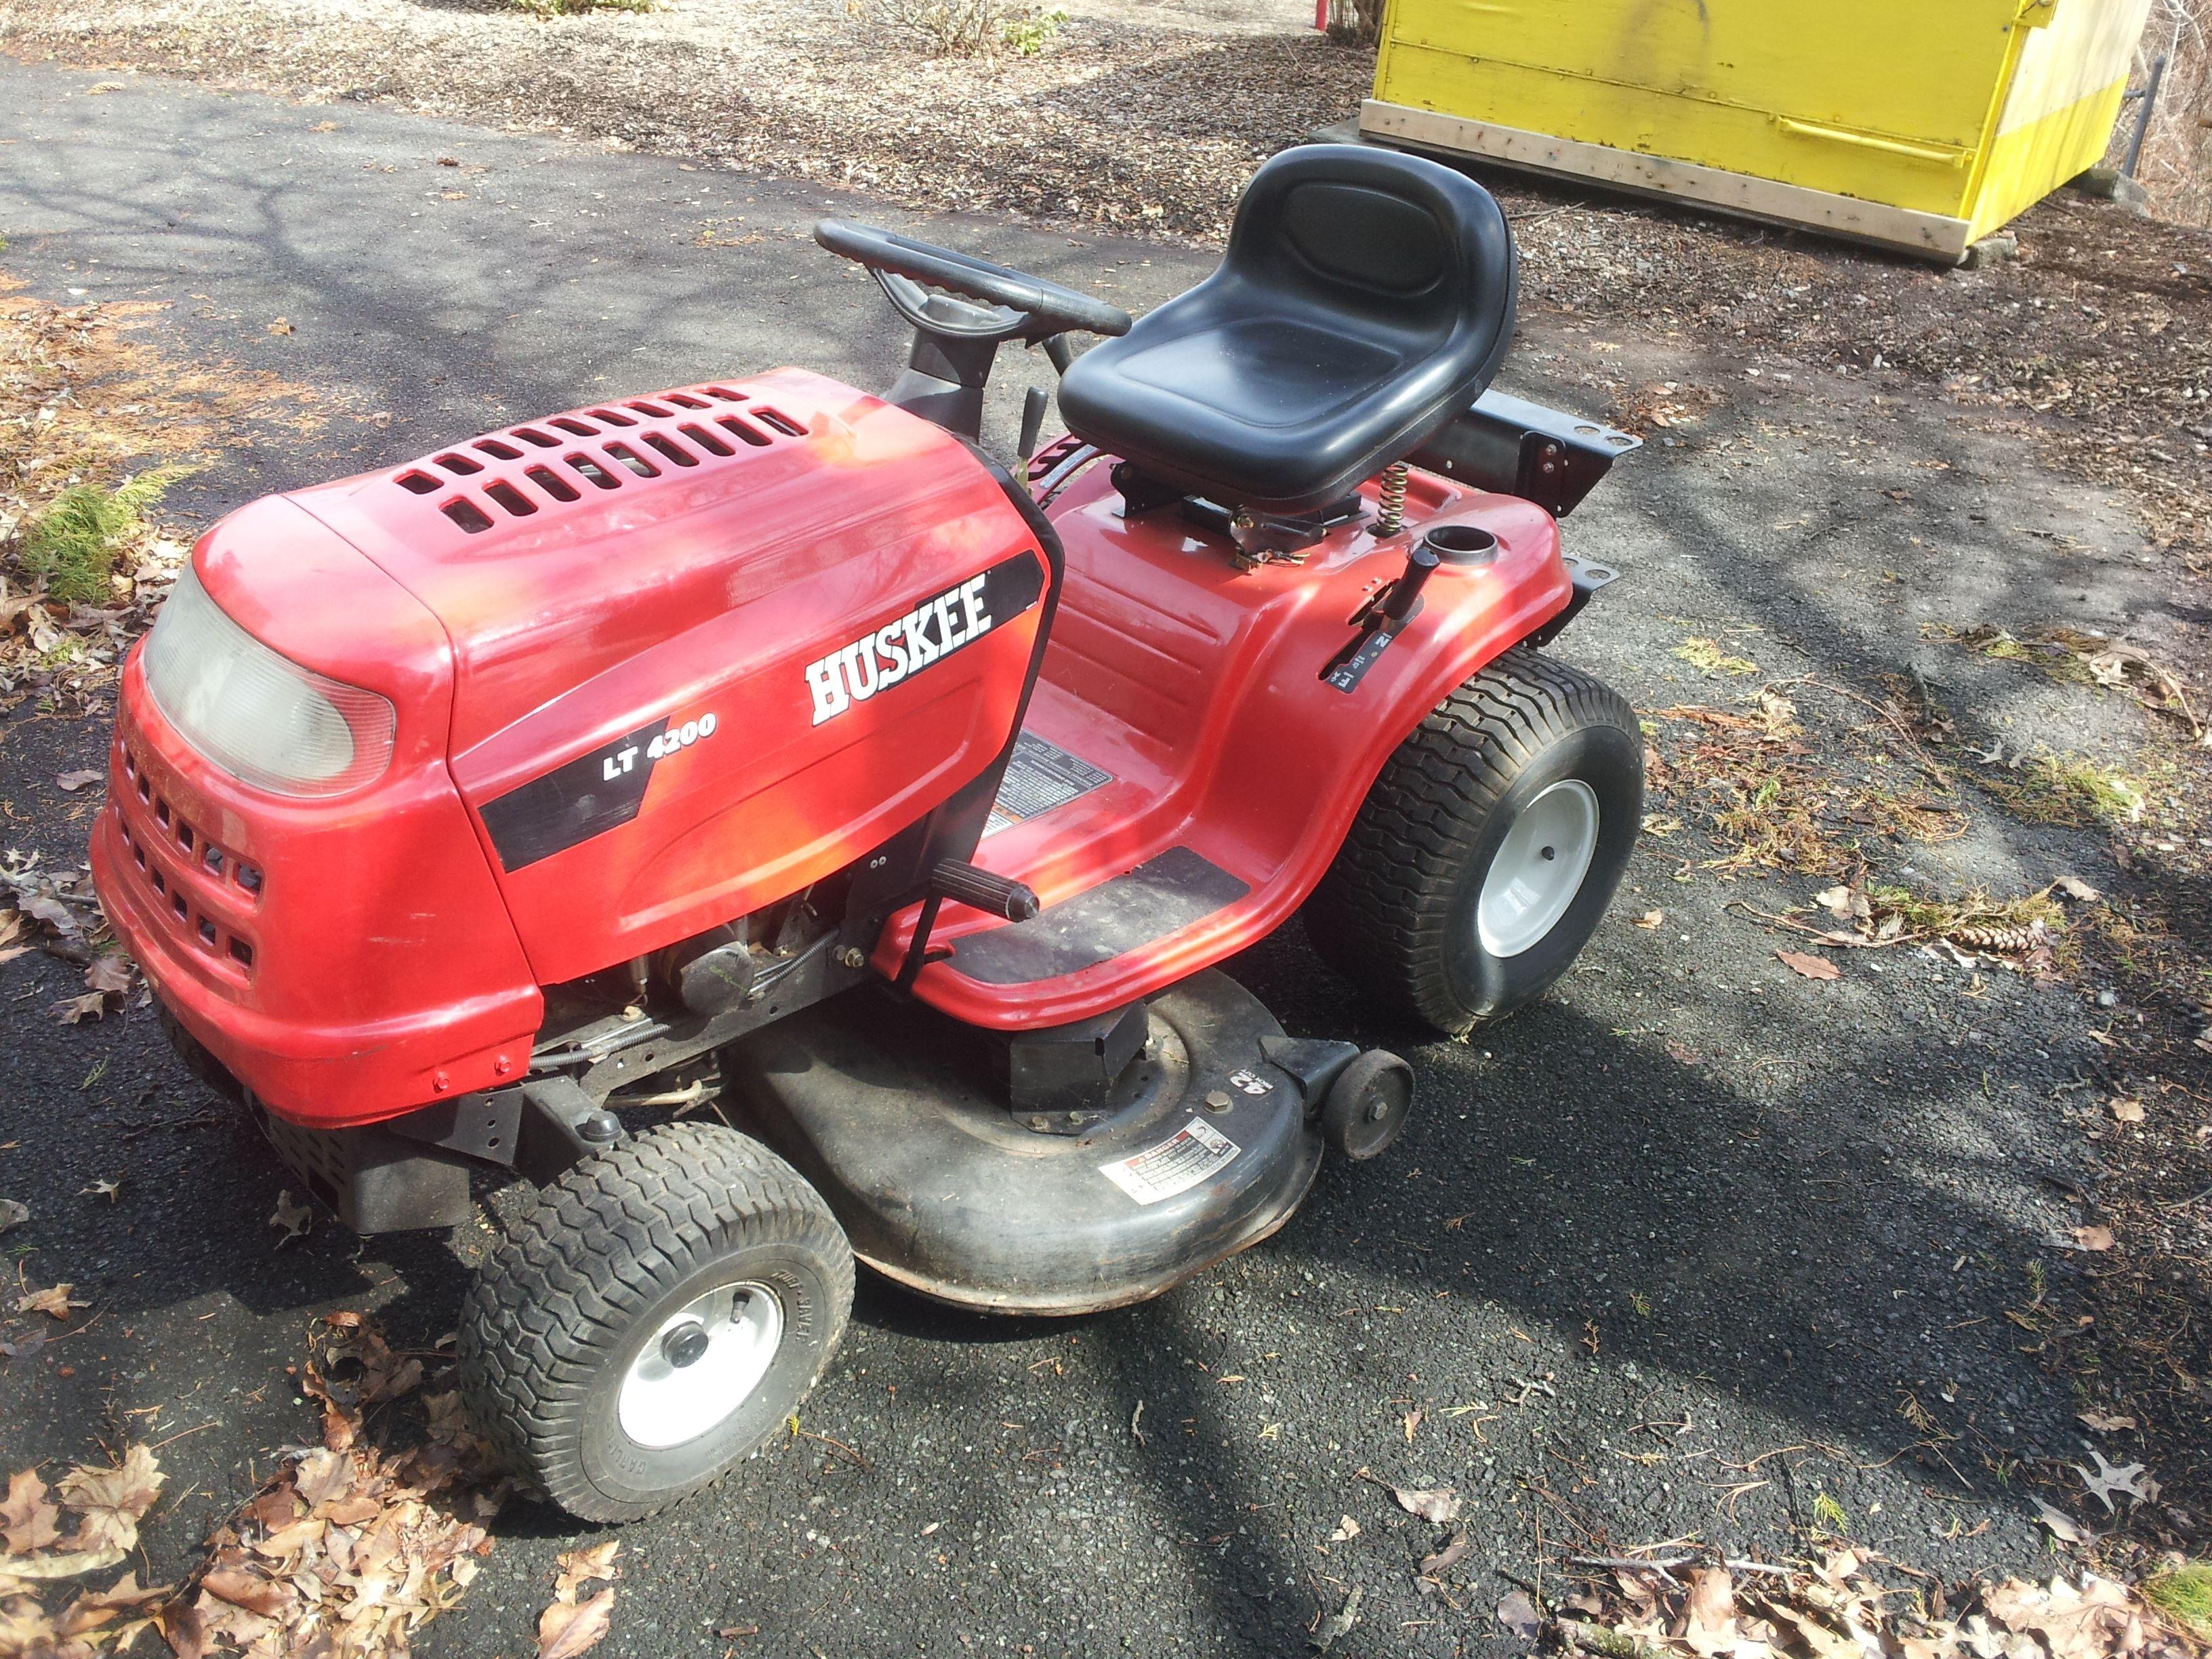 hight resolution of huskee lt 4200 riding mower for sale on municibid com